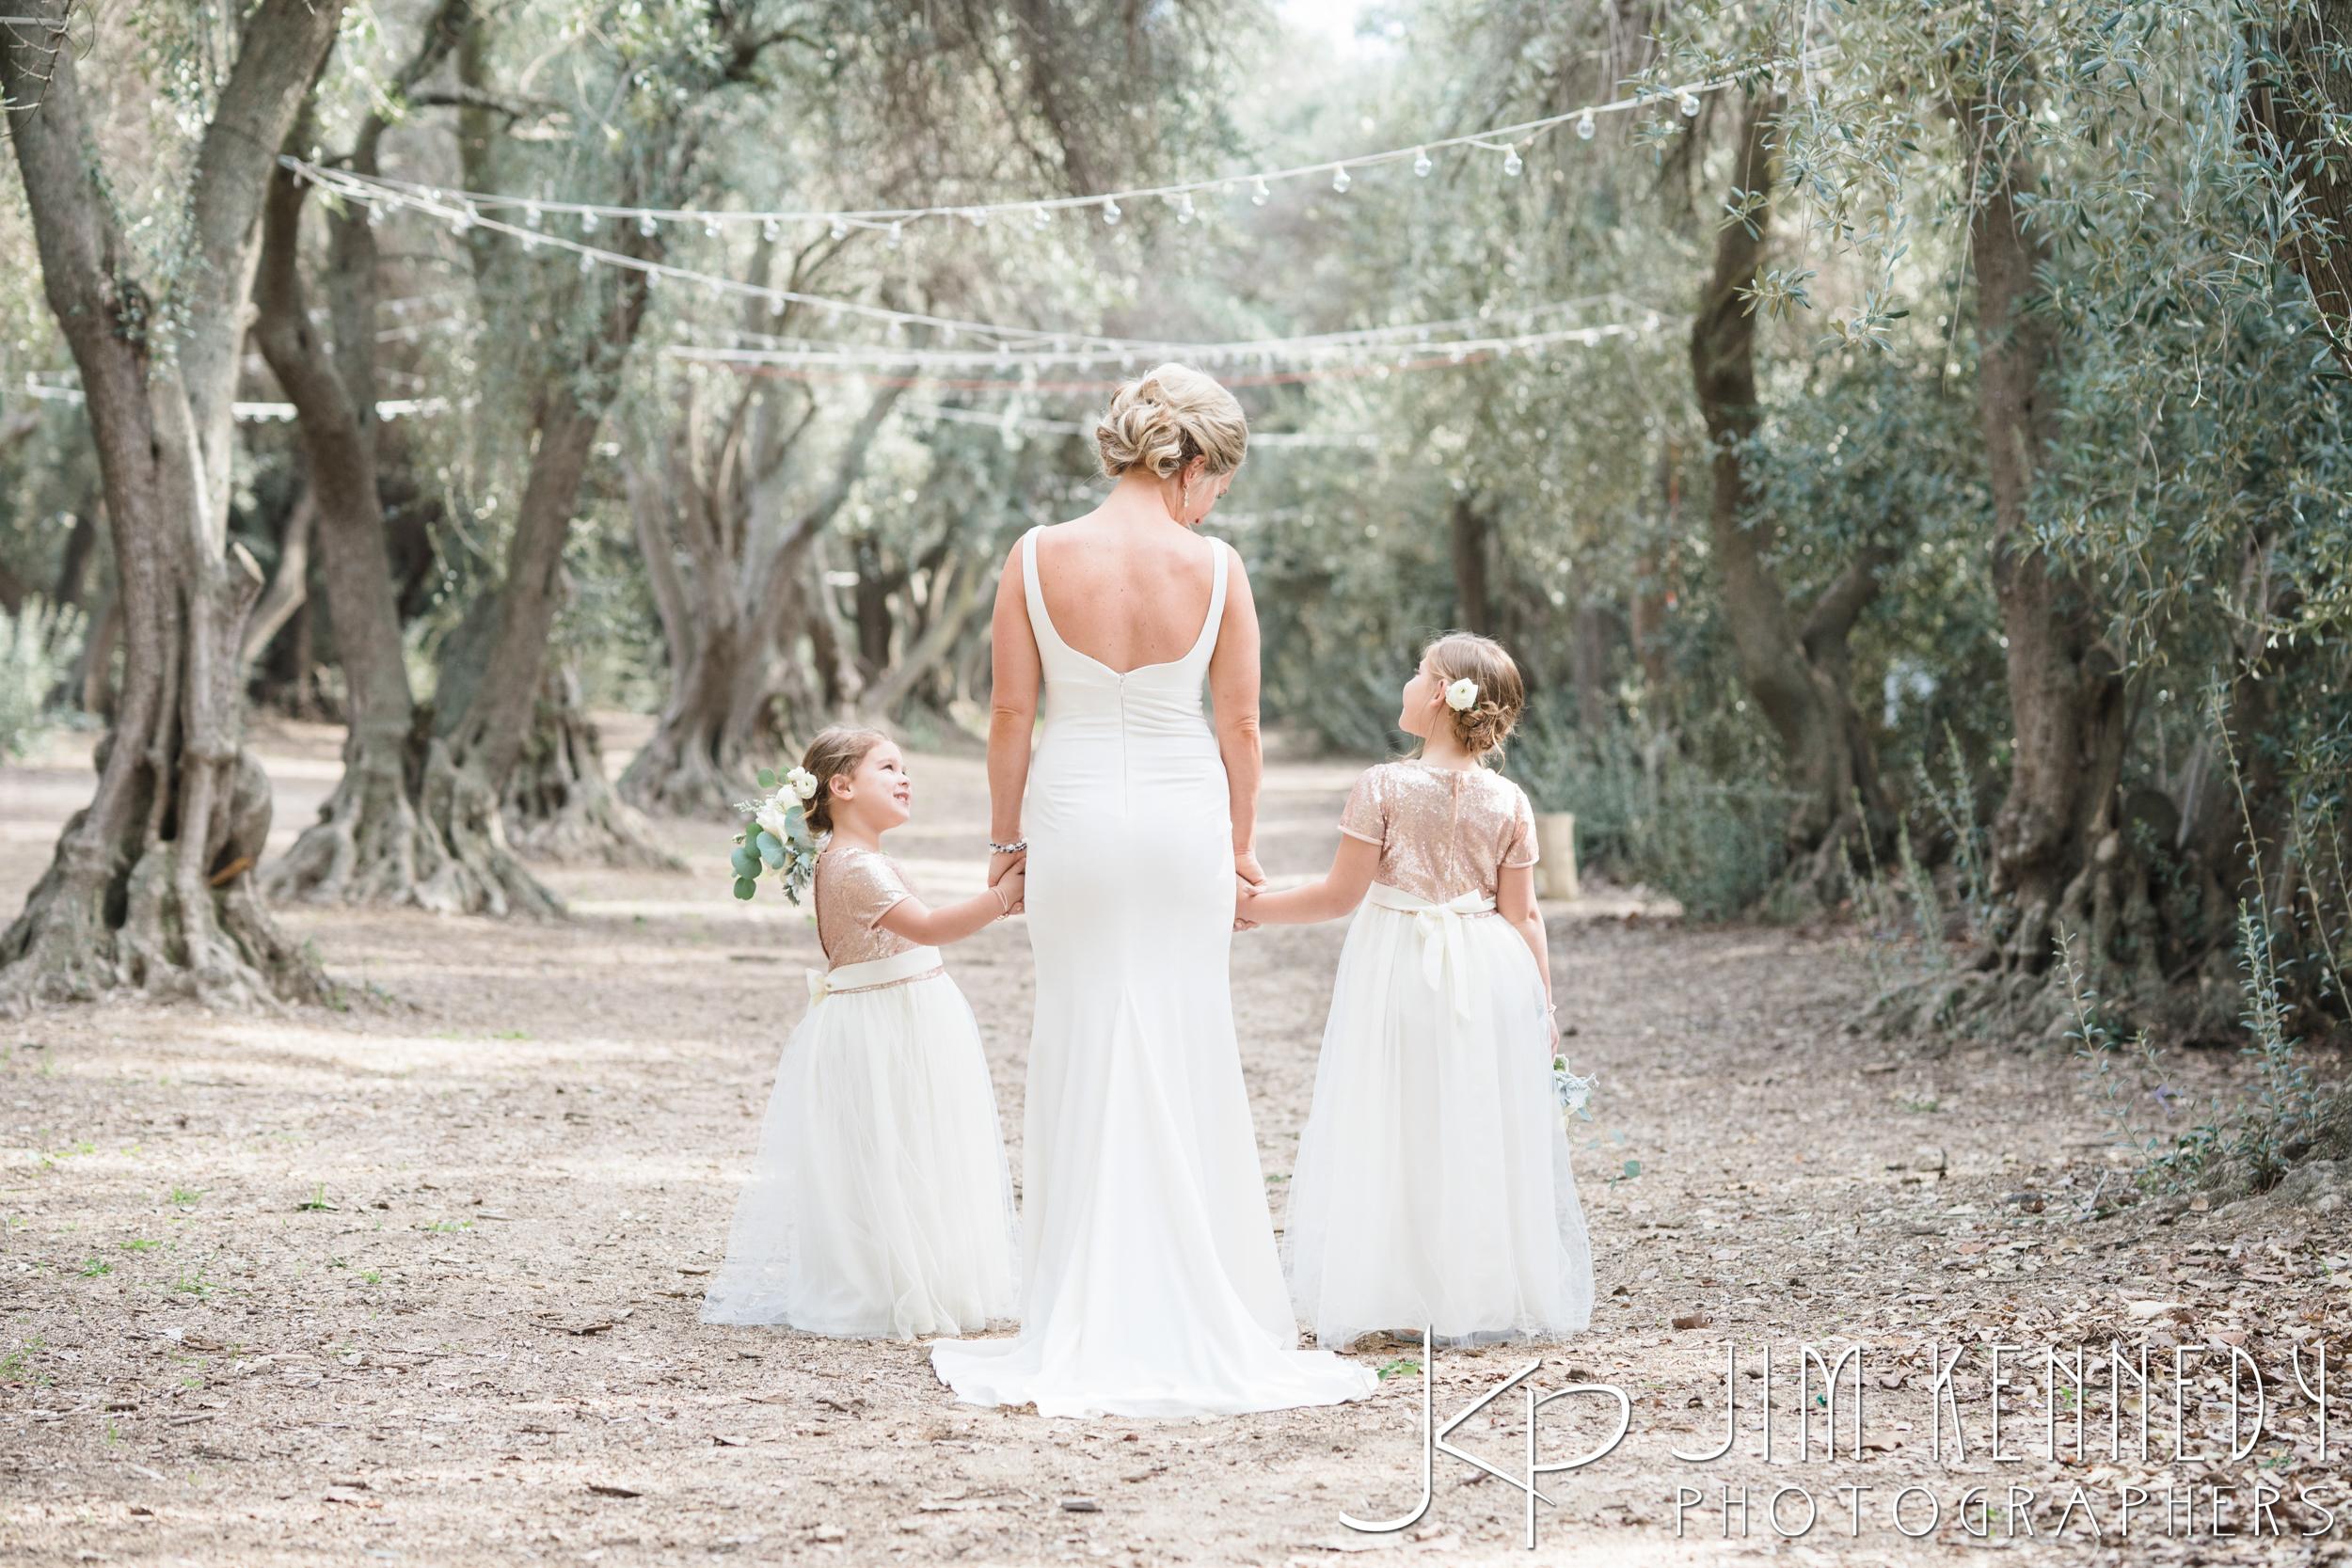 jim_kennedy_photographers_highland_springs_wedding_caitlyn_0067.jpg